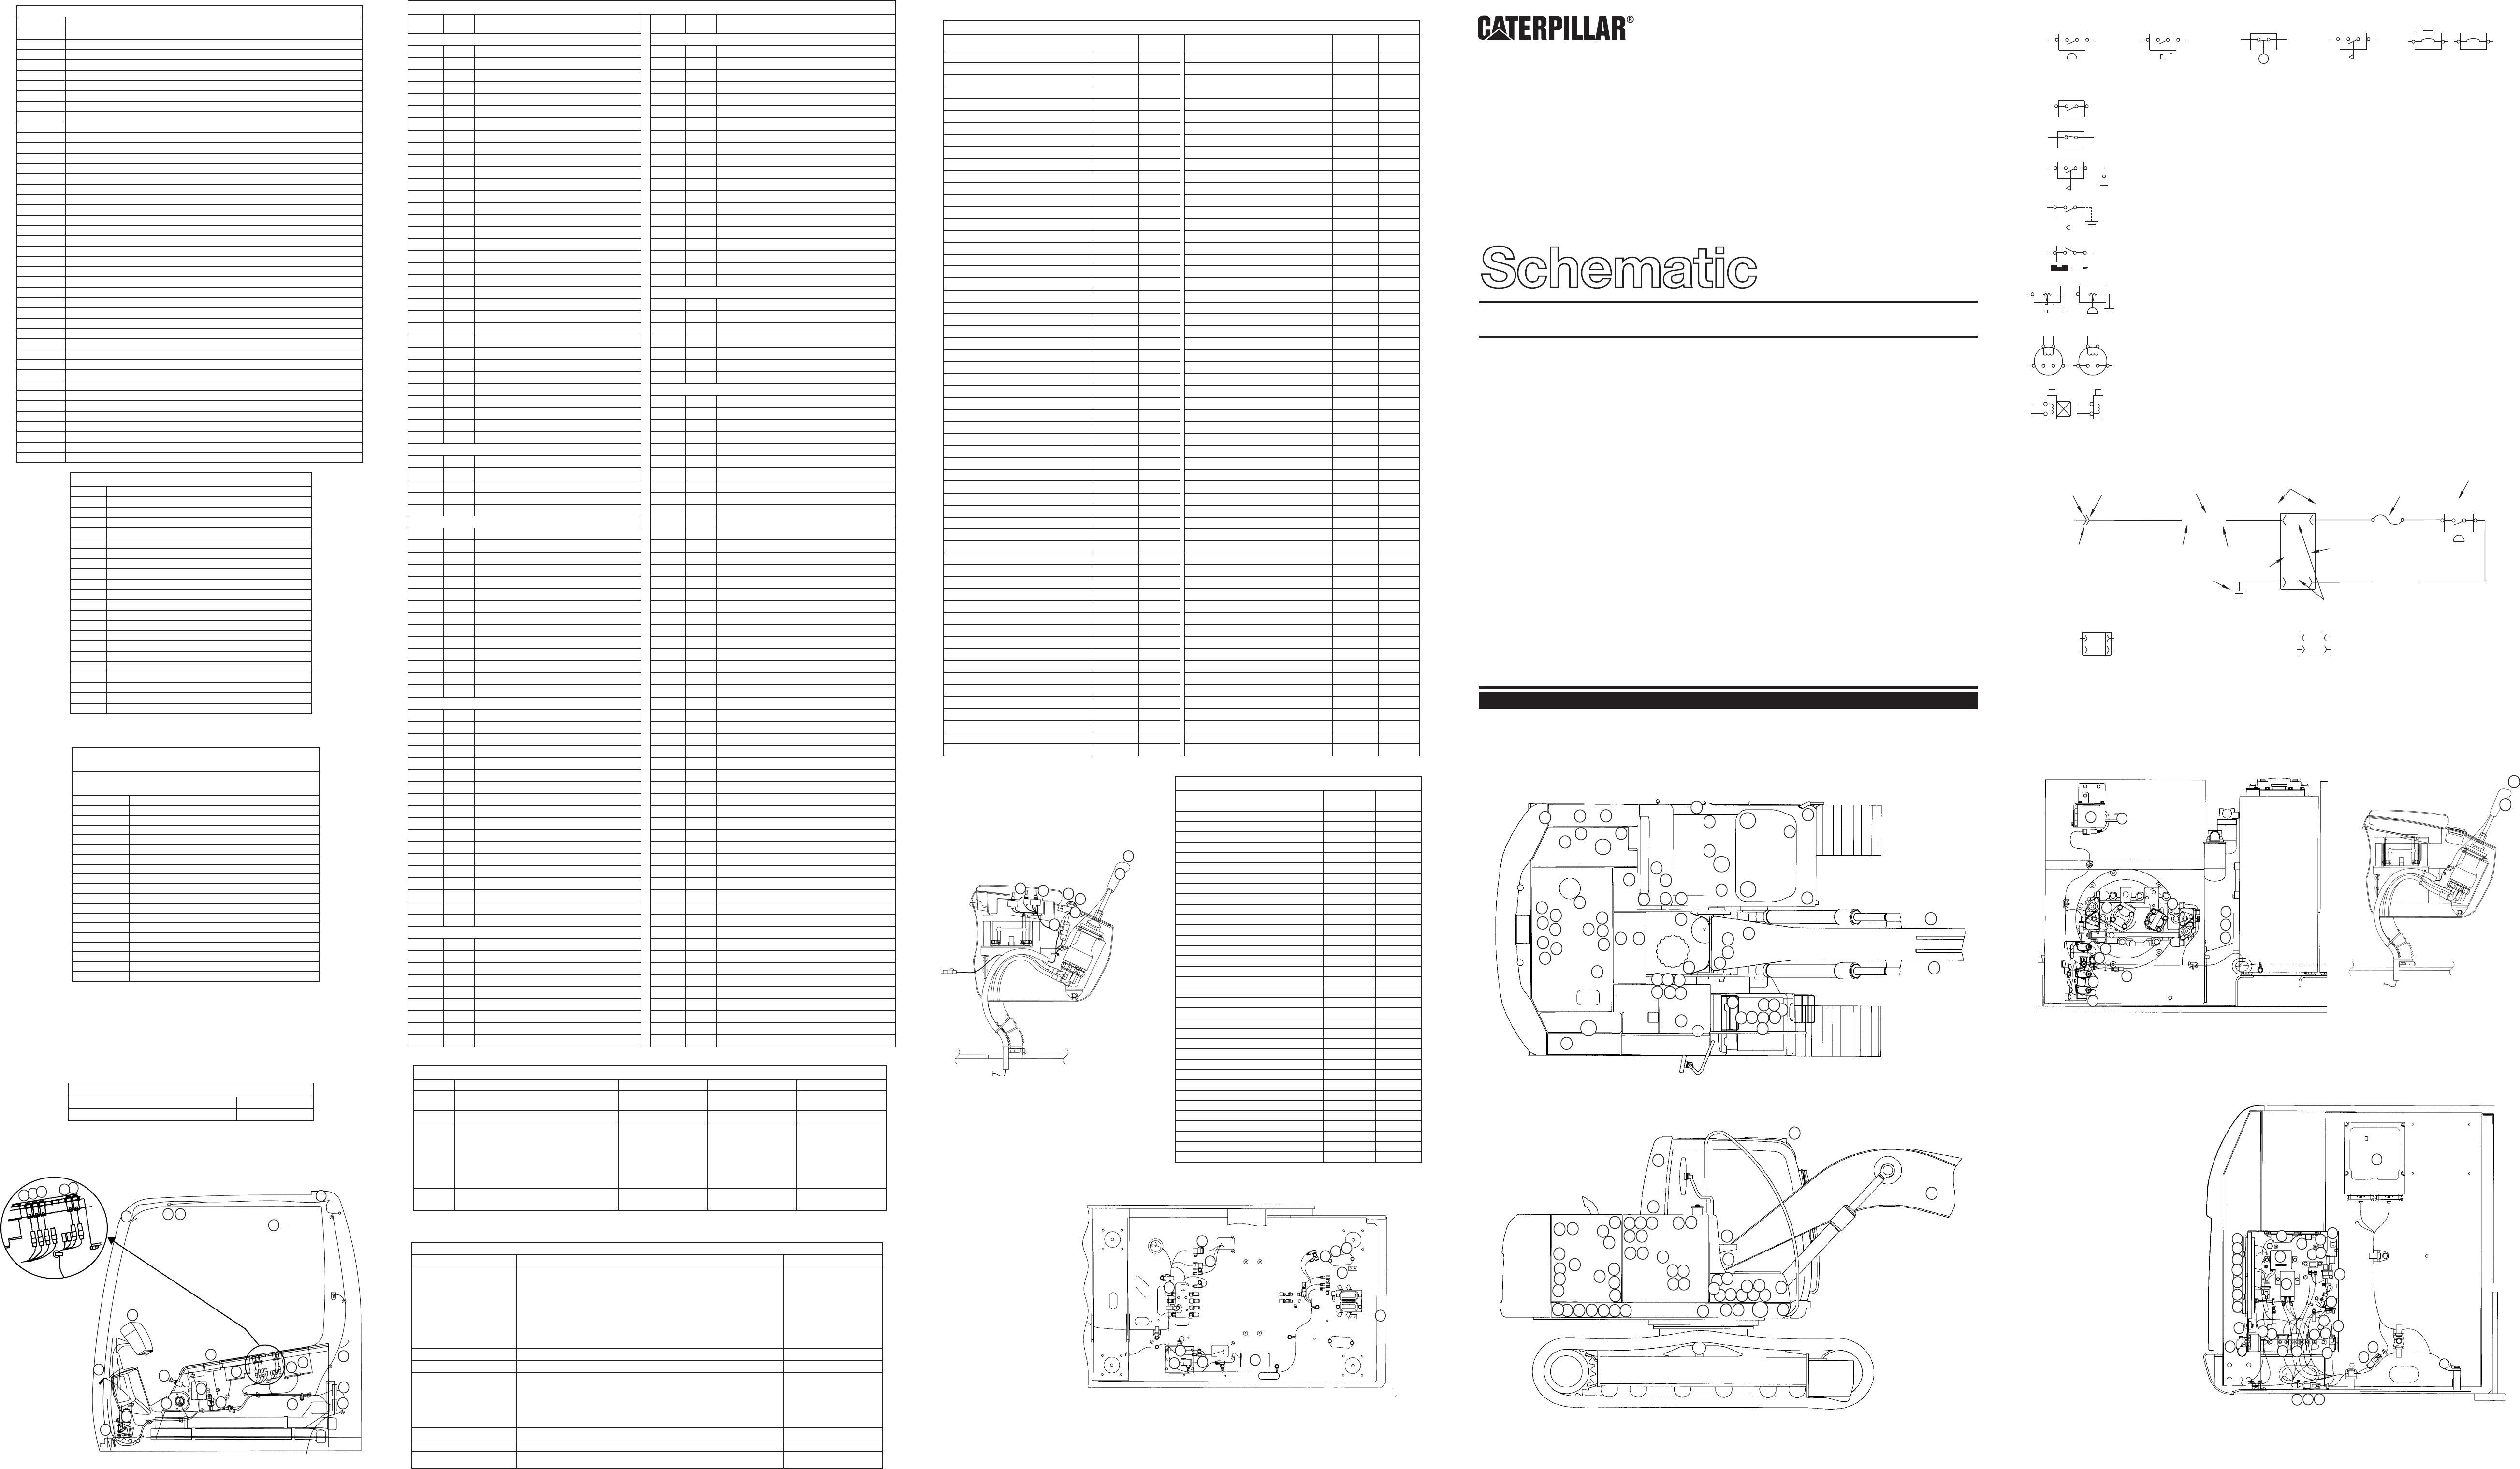 312C EXCAVATOR ELECTRICAL SCHEMATIC (VOL 1=MAIN, VOL 2=TOOL CONTROL) USED  IN SERVICE MANUAL RENR5500 | CAT Machines Electrical SchematicCAT Machines Electrical Schematic